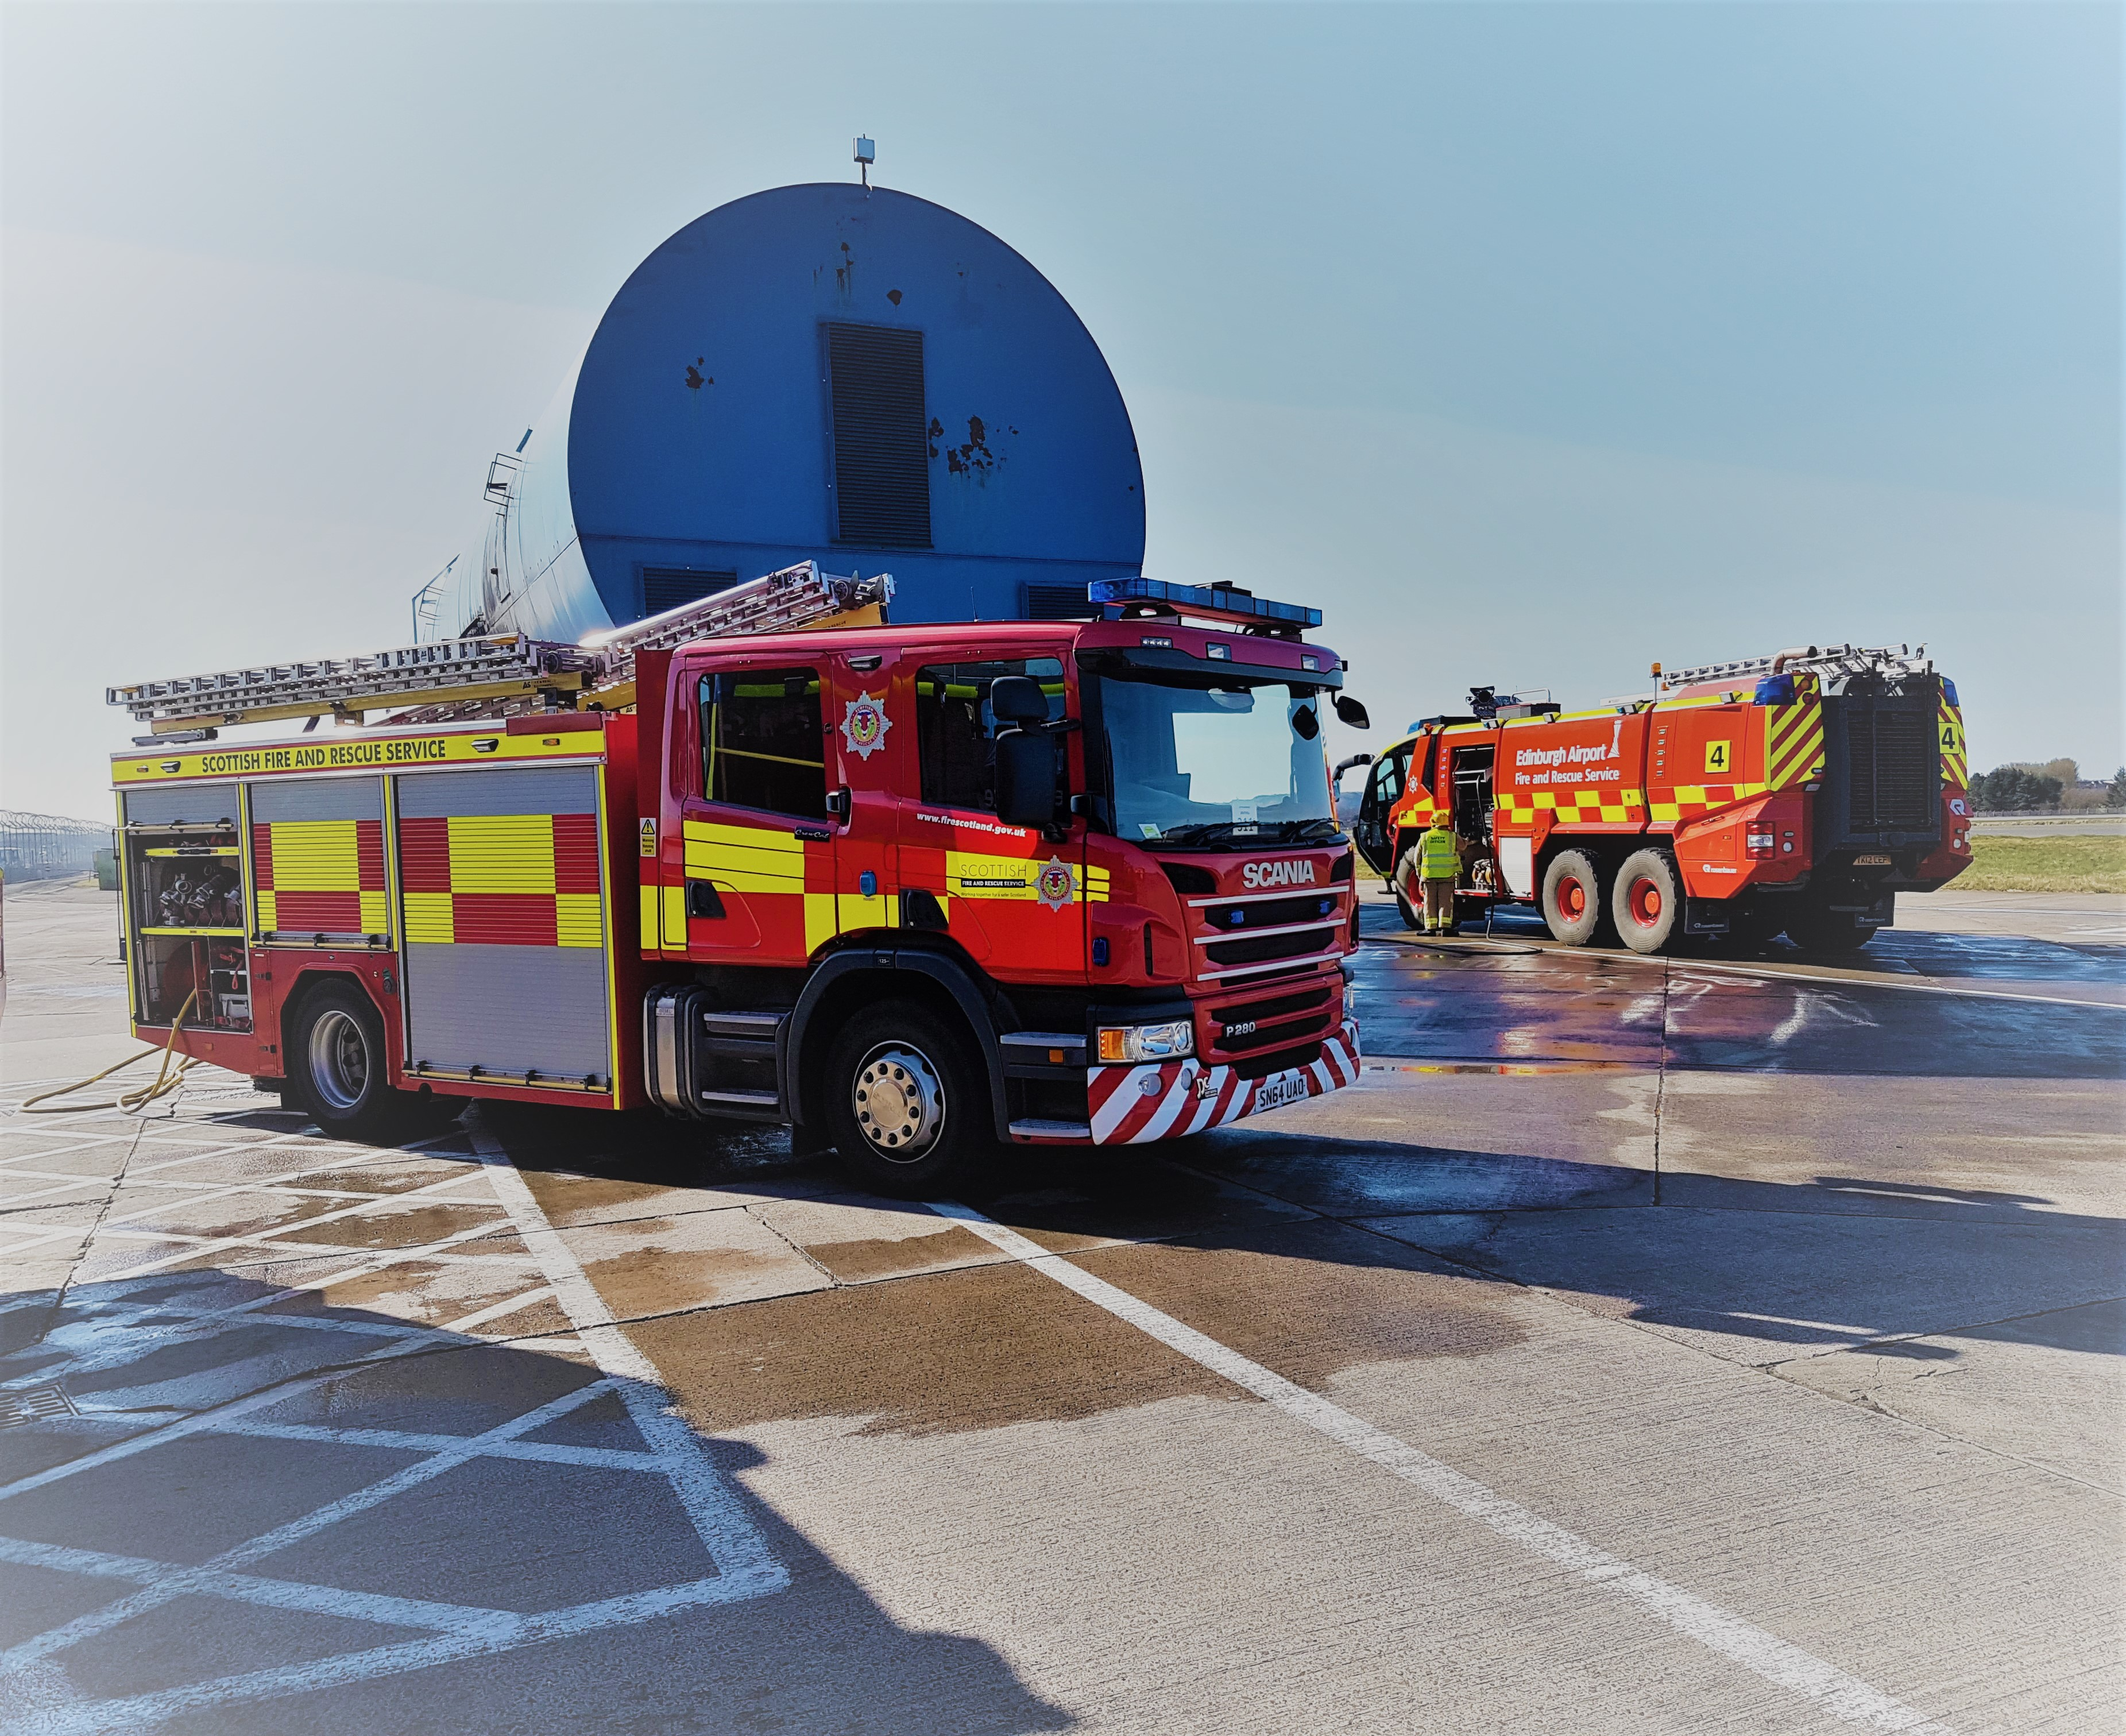 Training exercise at Edinburgh International Airport